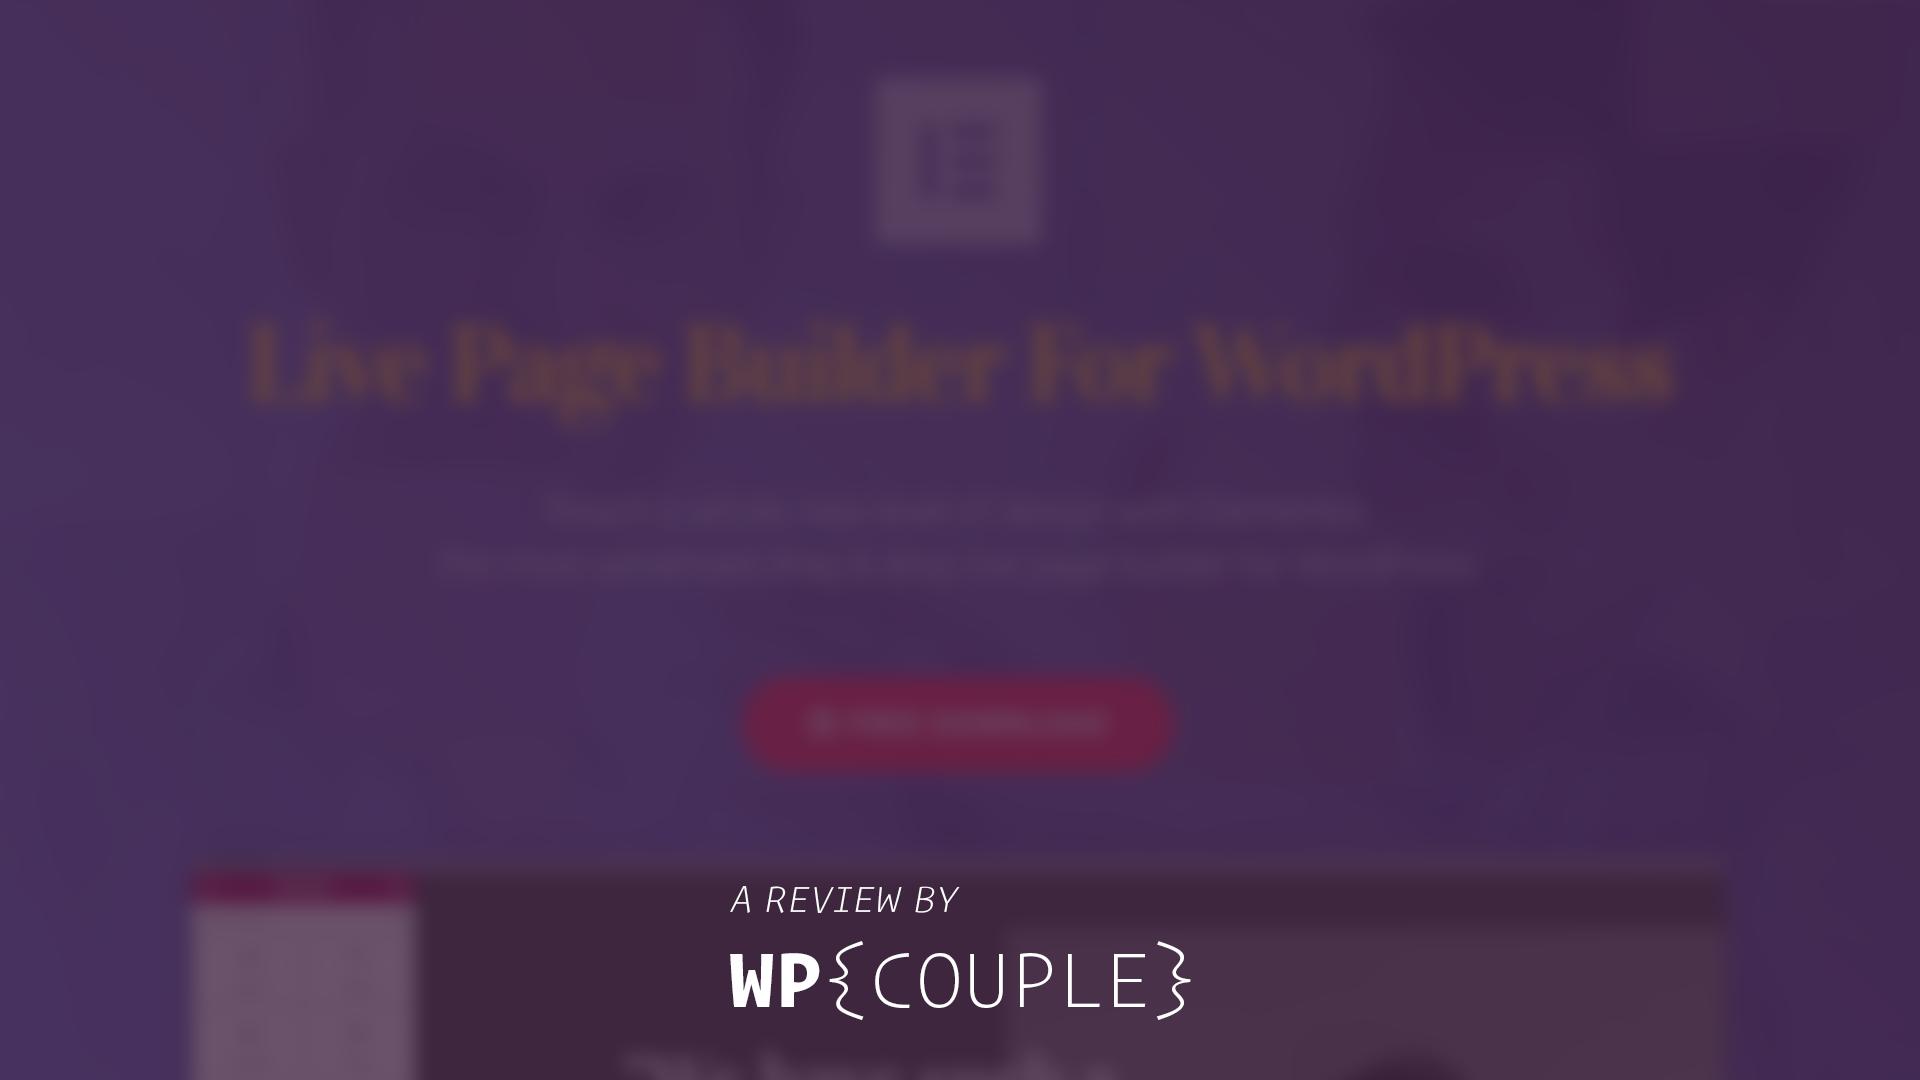 Elementor Page Builder Plugin: An In-Depth Plugin Review